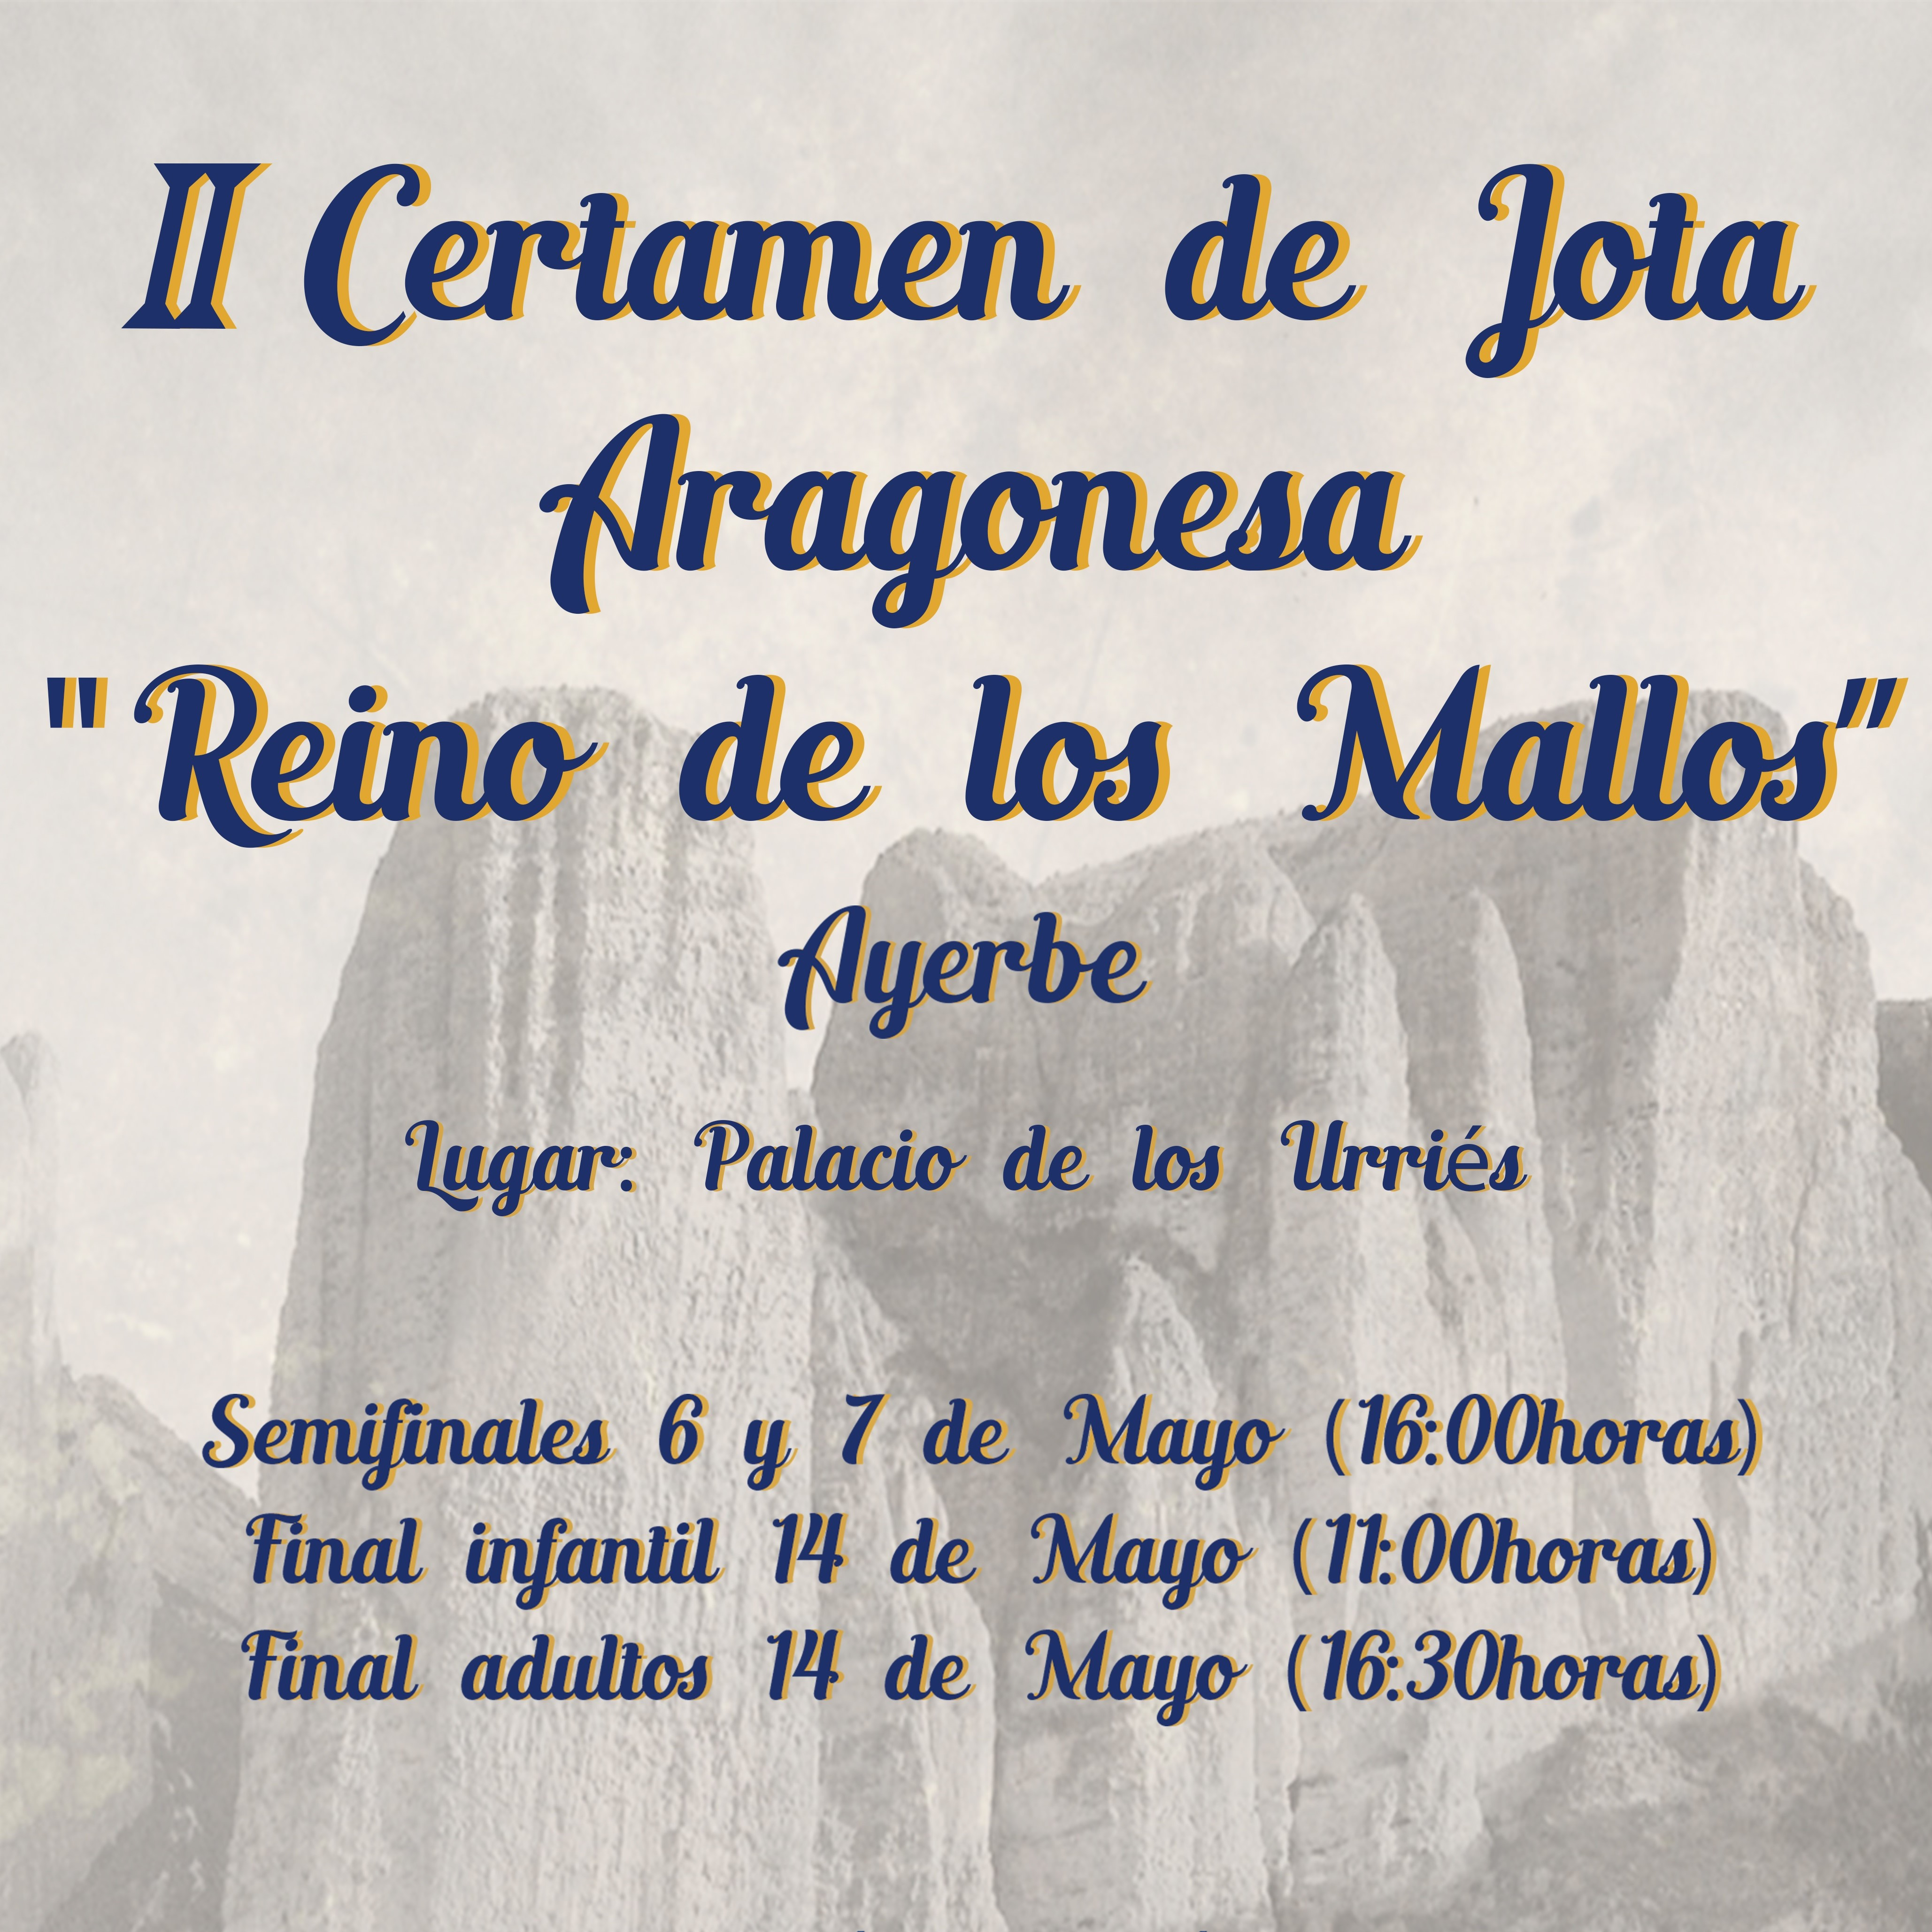 II Certamen de Jota Aragonesa